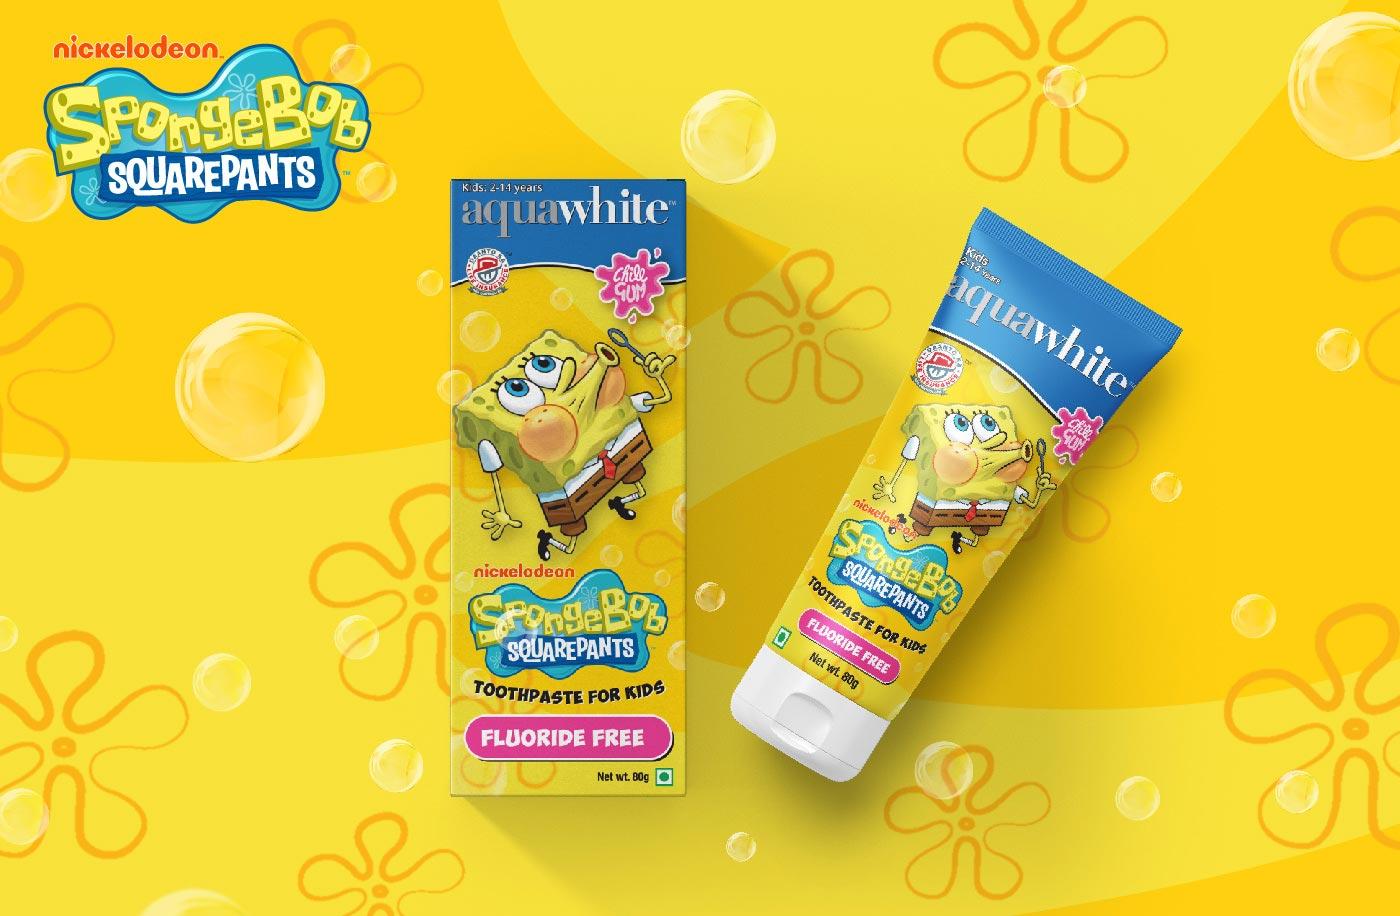 spongebob quarepants